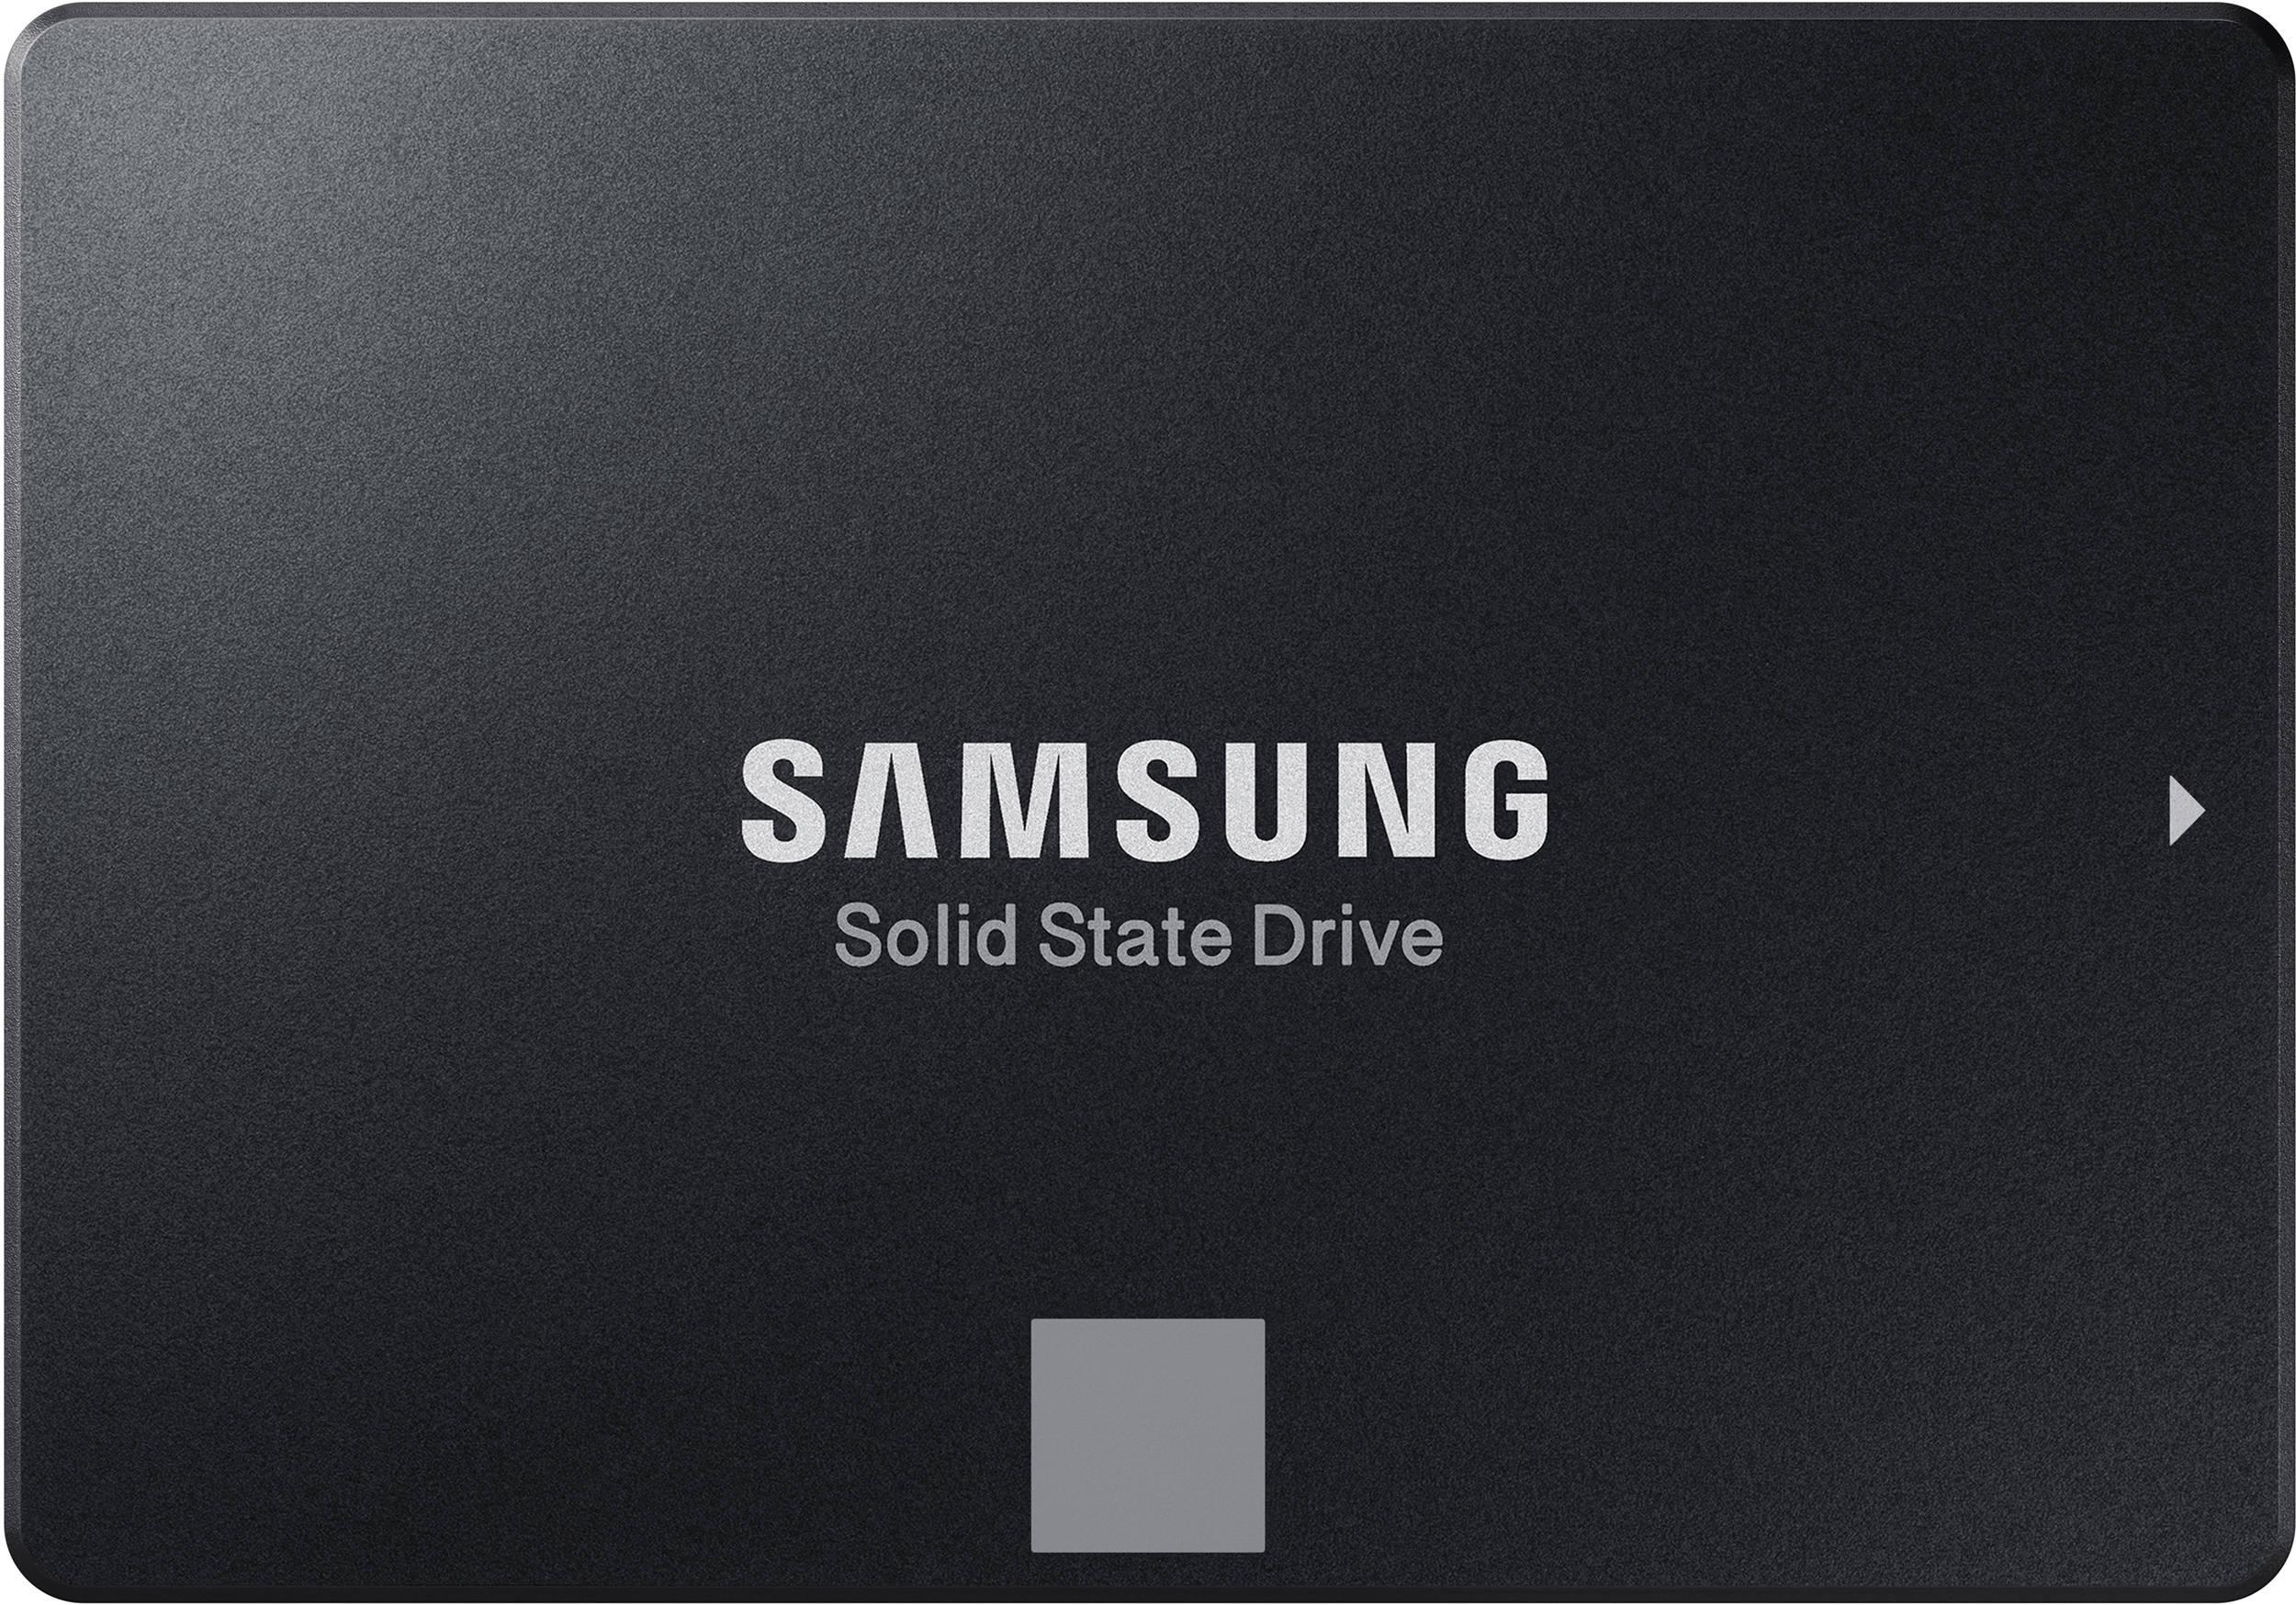 Samsung 860 EVO SATA III Internal SSD